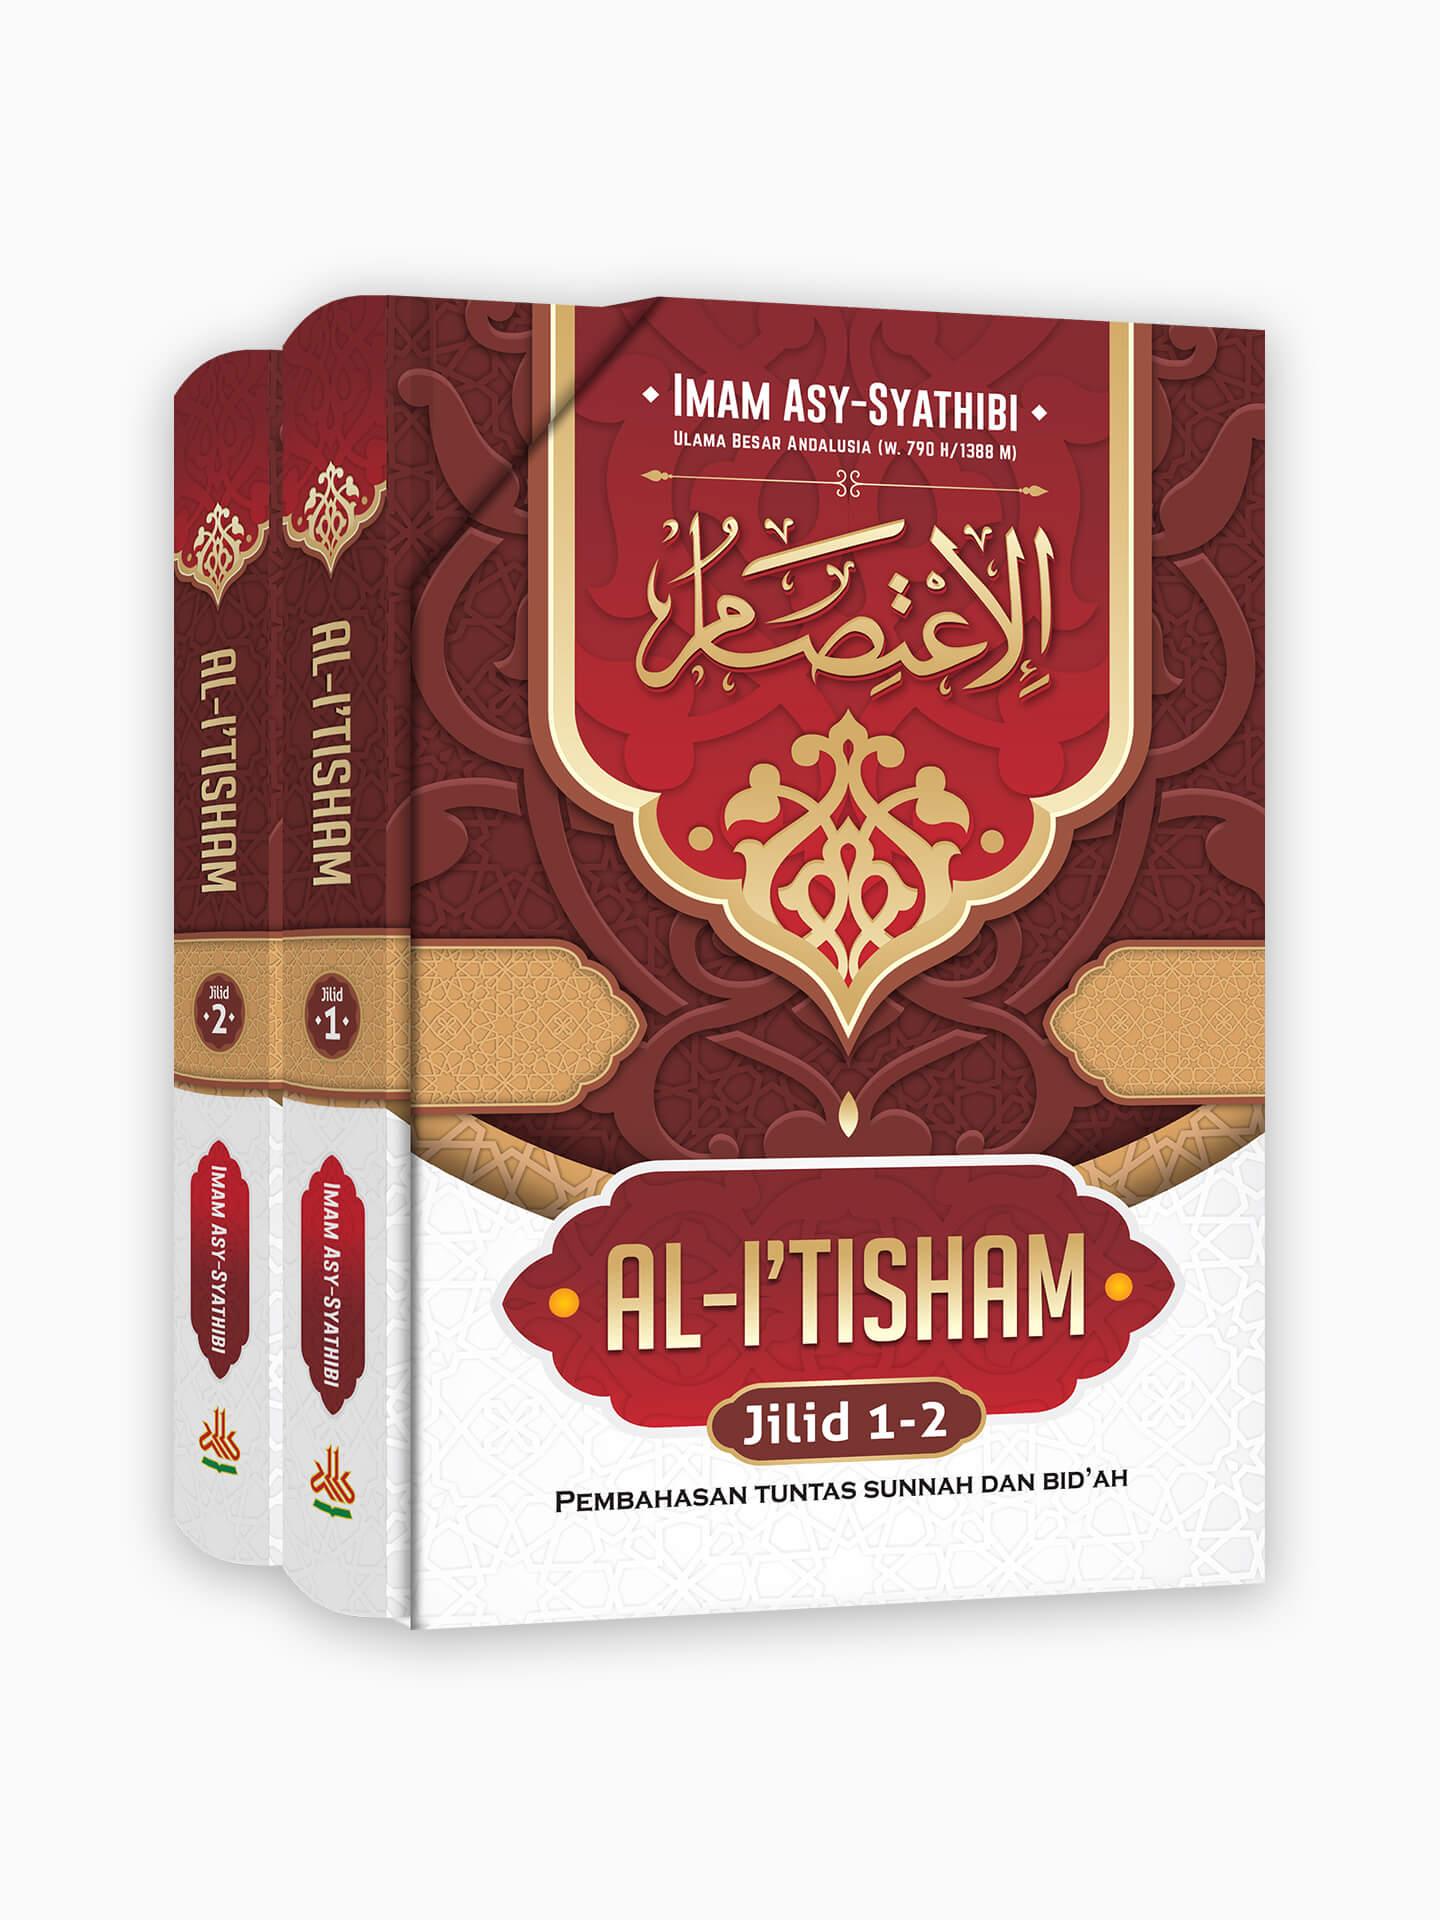 Al-I'tisham : Pembahasan Tuntas Sunnah dan Bid'ah